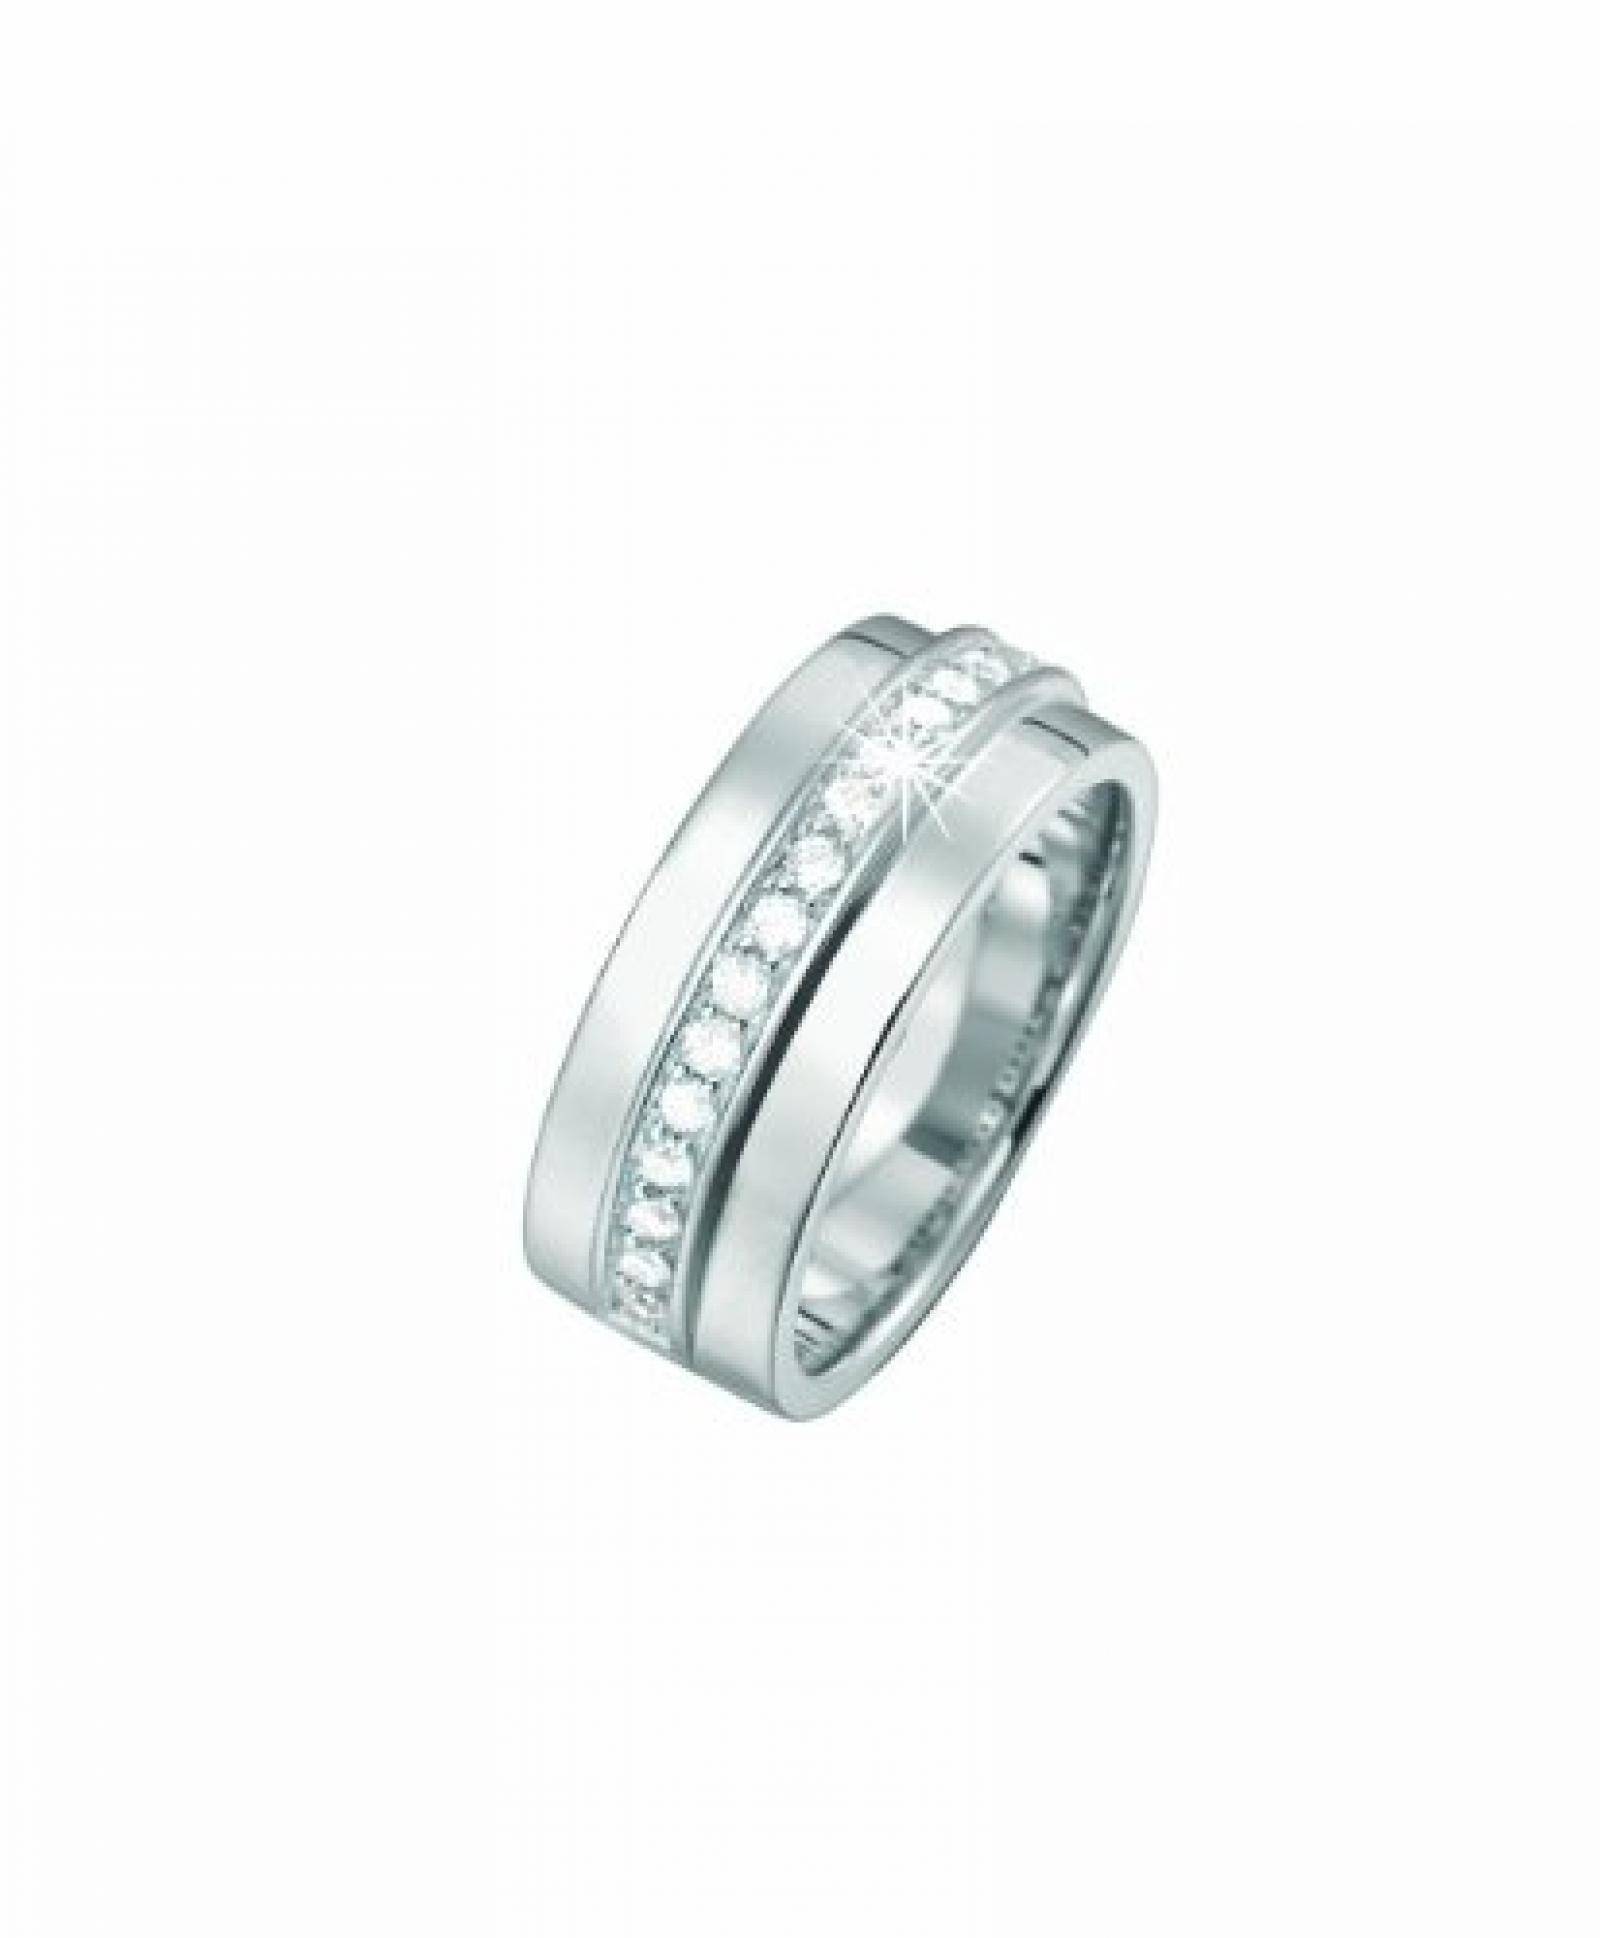 Pierre Cardin Damen-Ring Les Rondelles Sterling-Silber 925 PCRG90221A